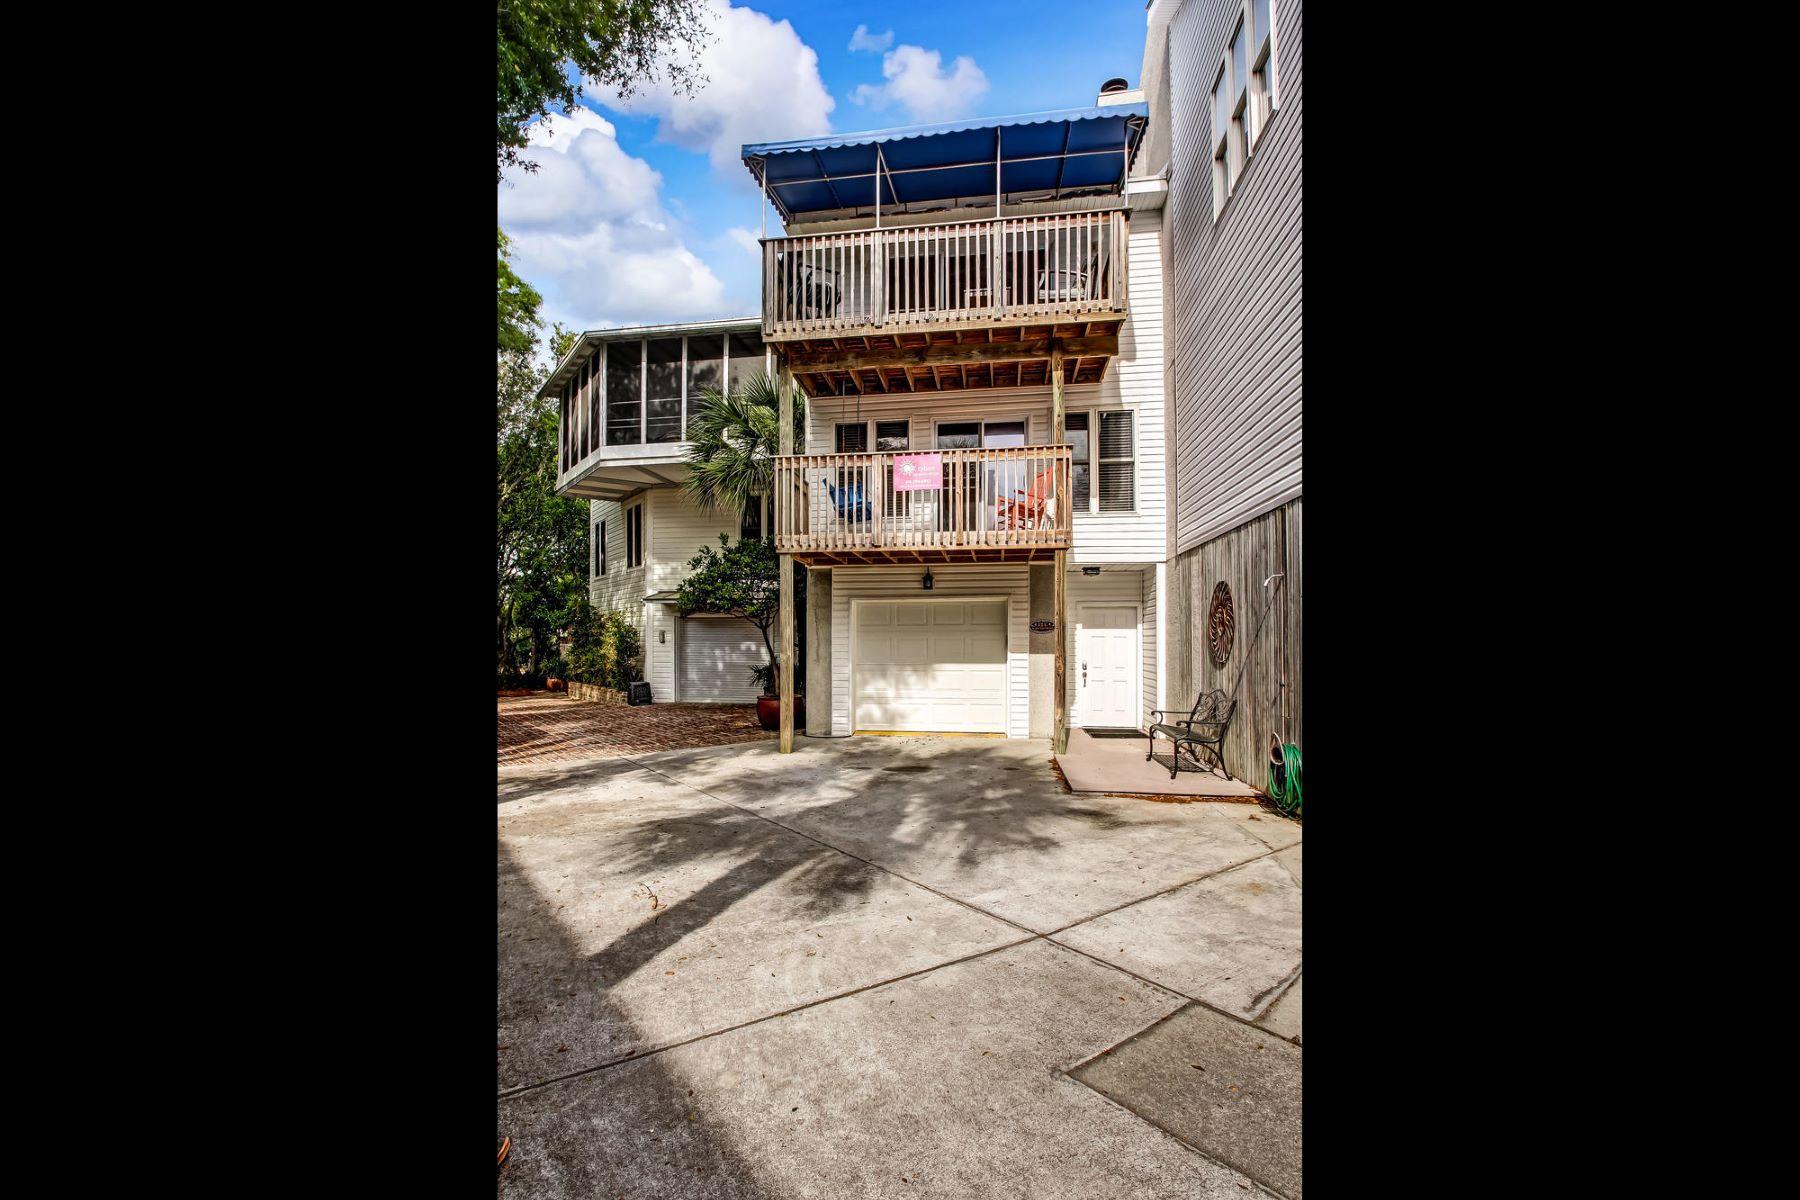 Additional photo for property listing at 12 Van Horne Ave Unit E Tybee Island, Georgia 31328 Estados Unidos